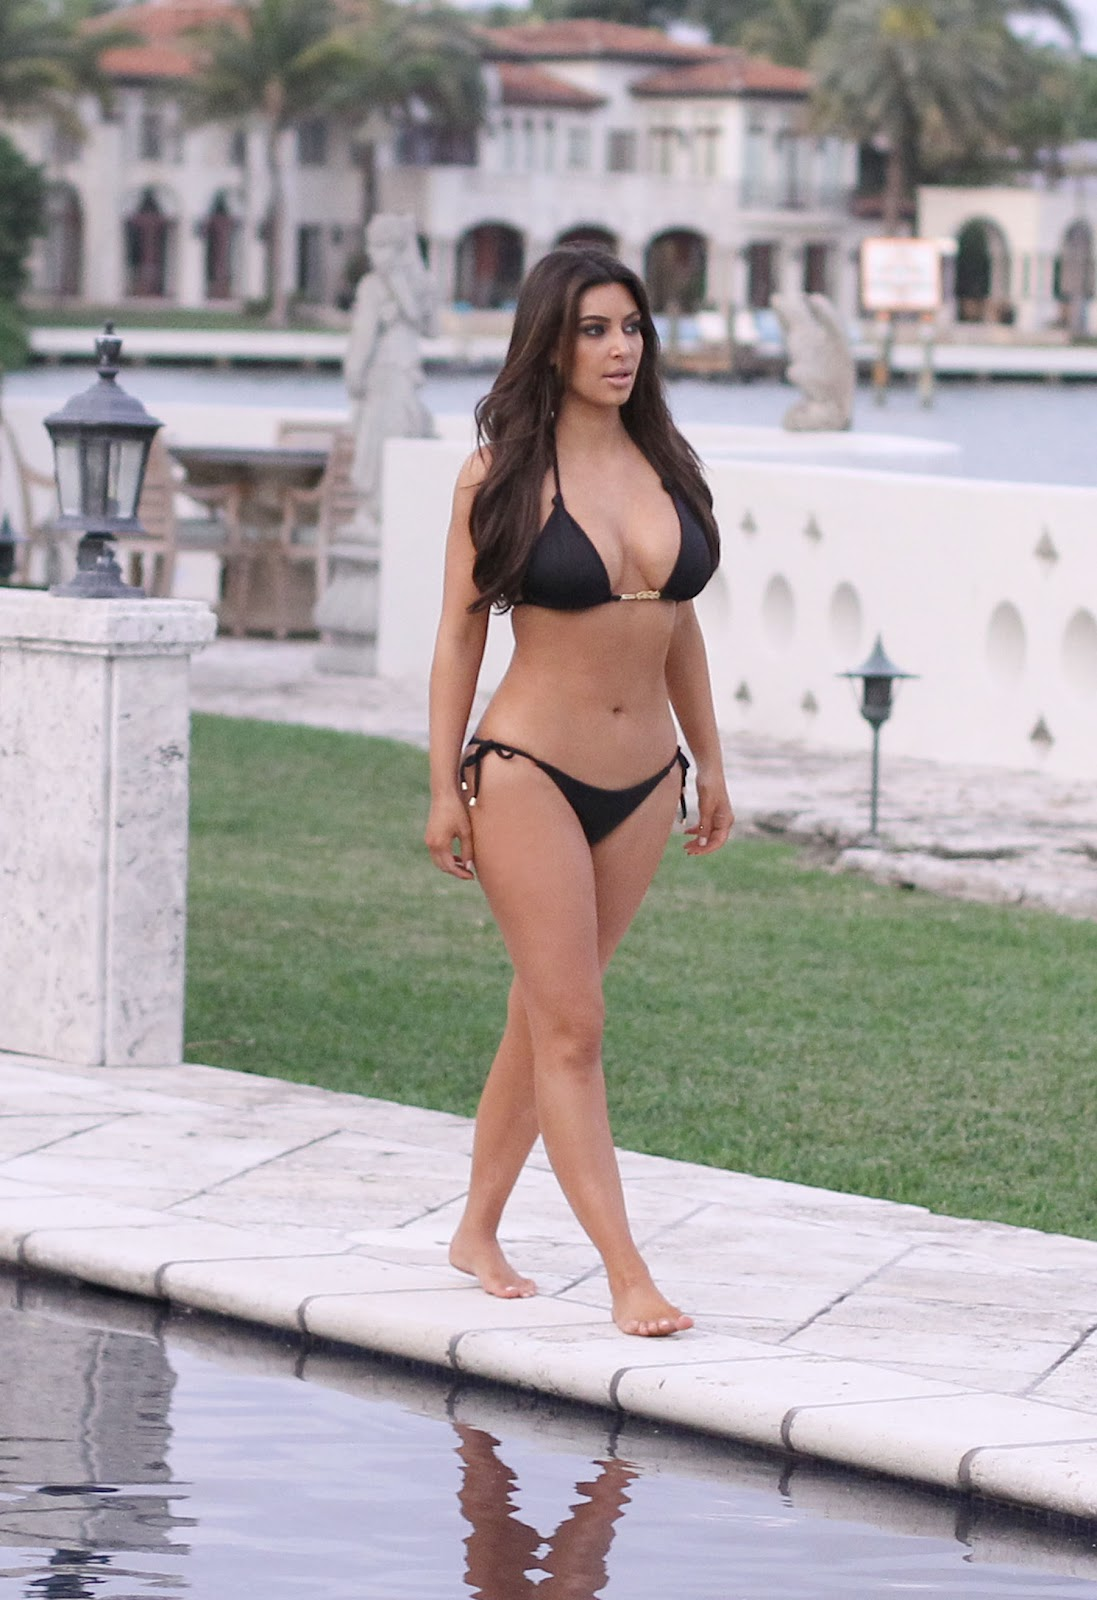 Kim Kardashian Hottest S3xiest Photo Images Pics HollywoodGossip